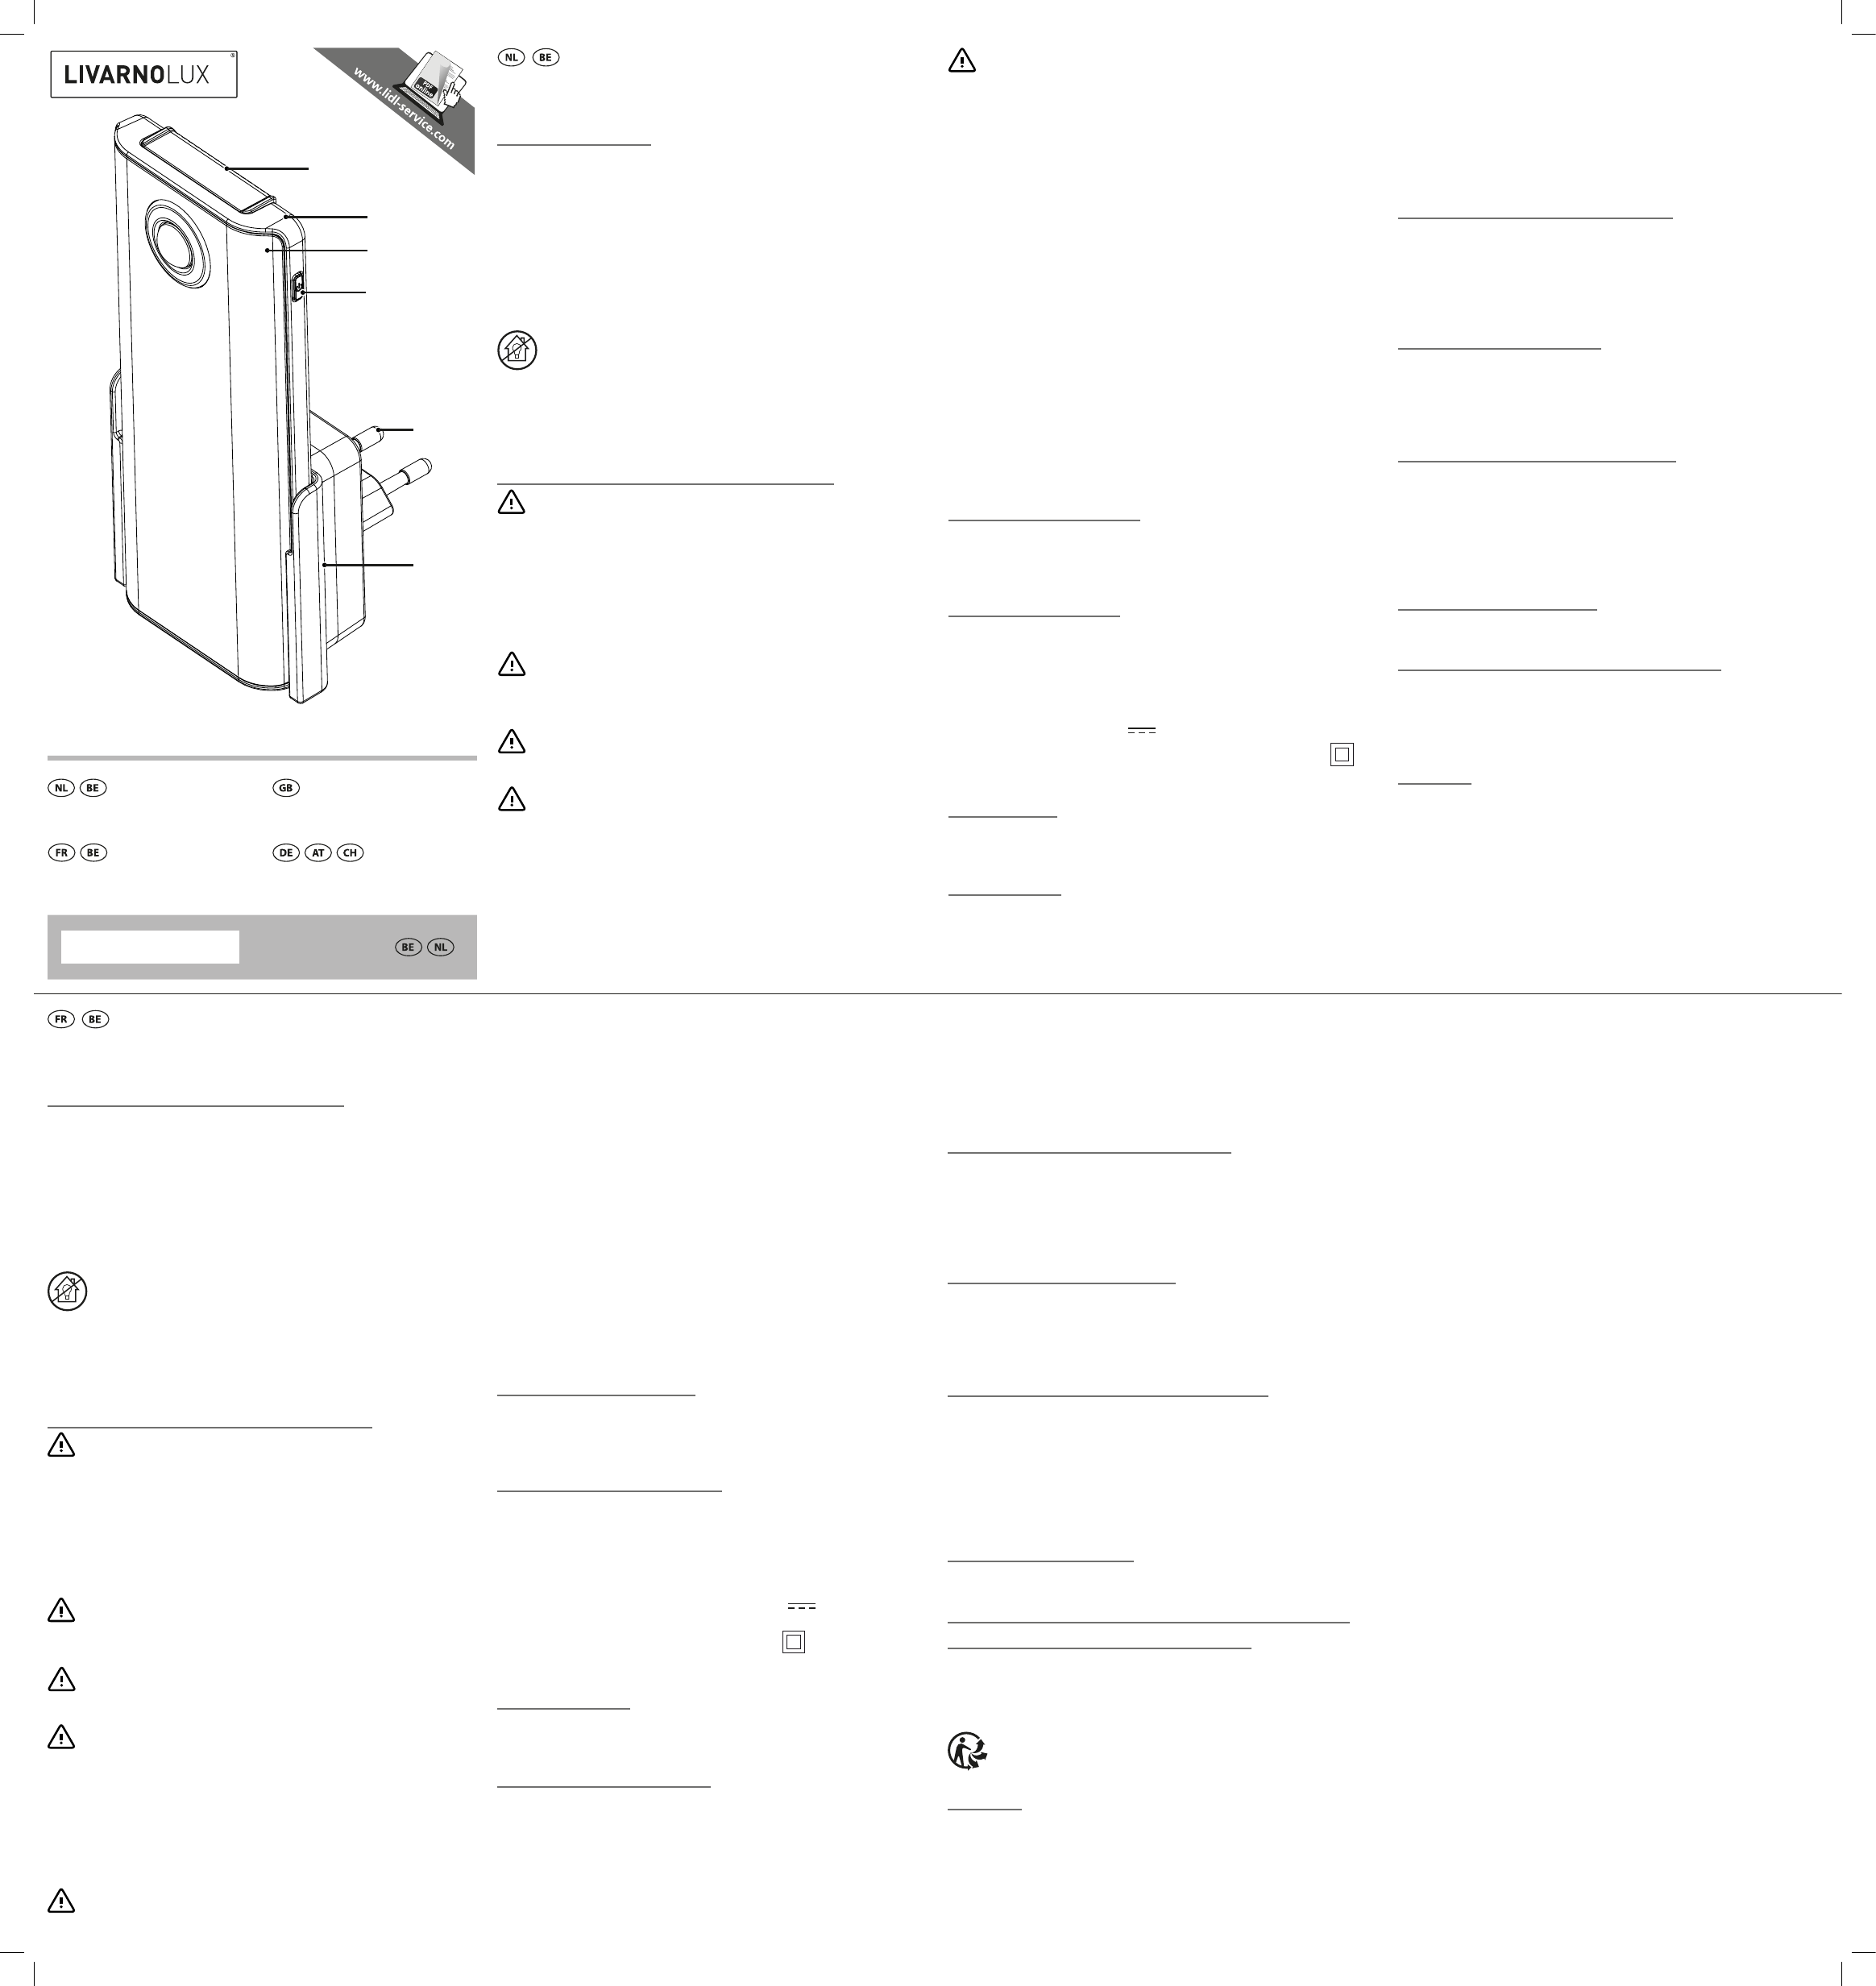 Livarnolux Handleiding 1pagina 2 Ian 2deutsch 278006 Van n0m8vNwO